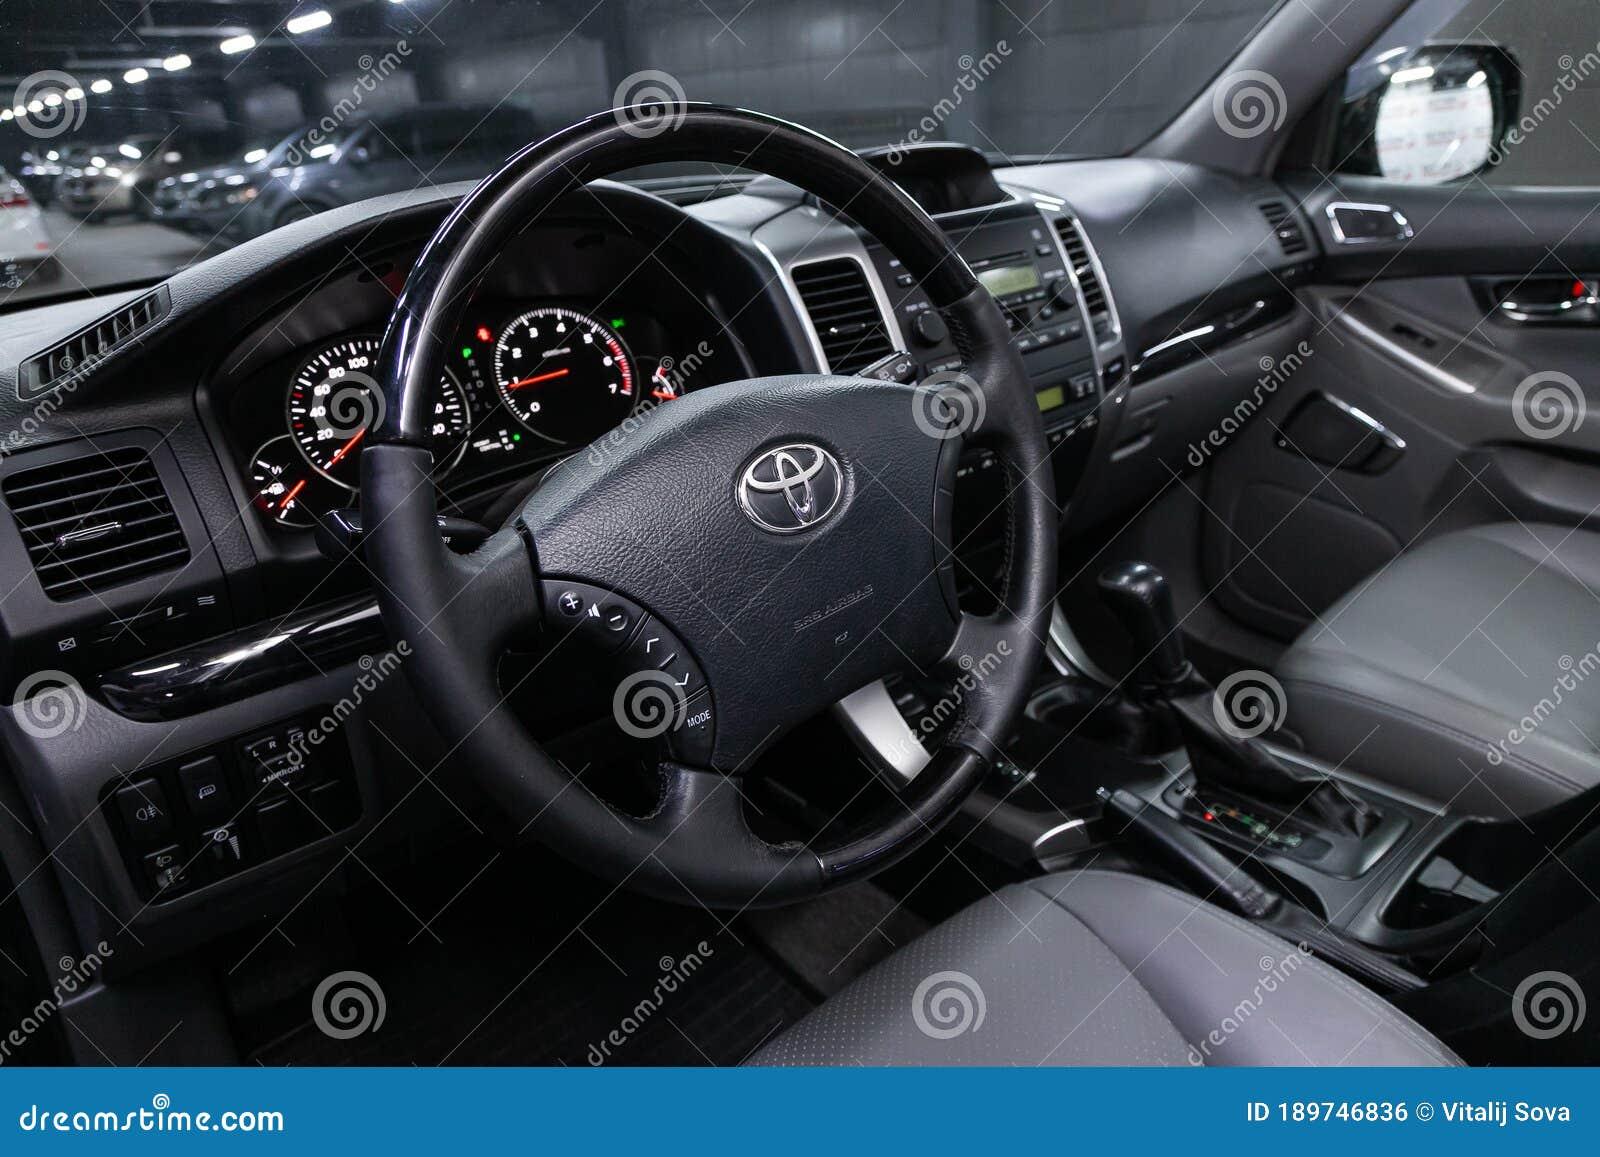 Novosibirsk Russia April 22 2020 Toyota Land Cruiser Prado Editorial Photo Image Of Performance Glass 189746836